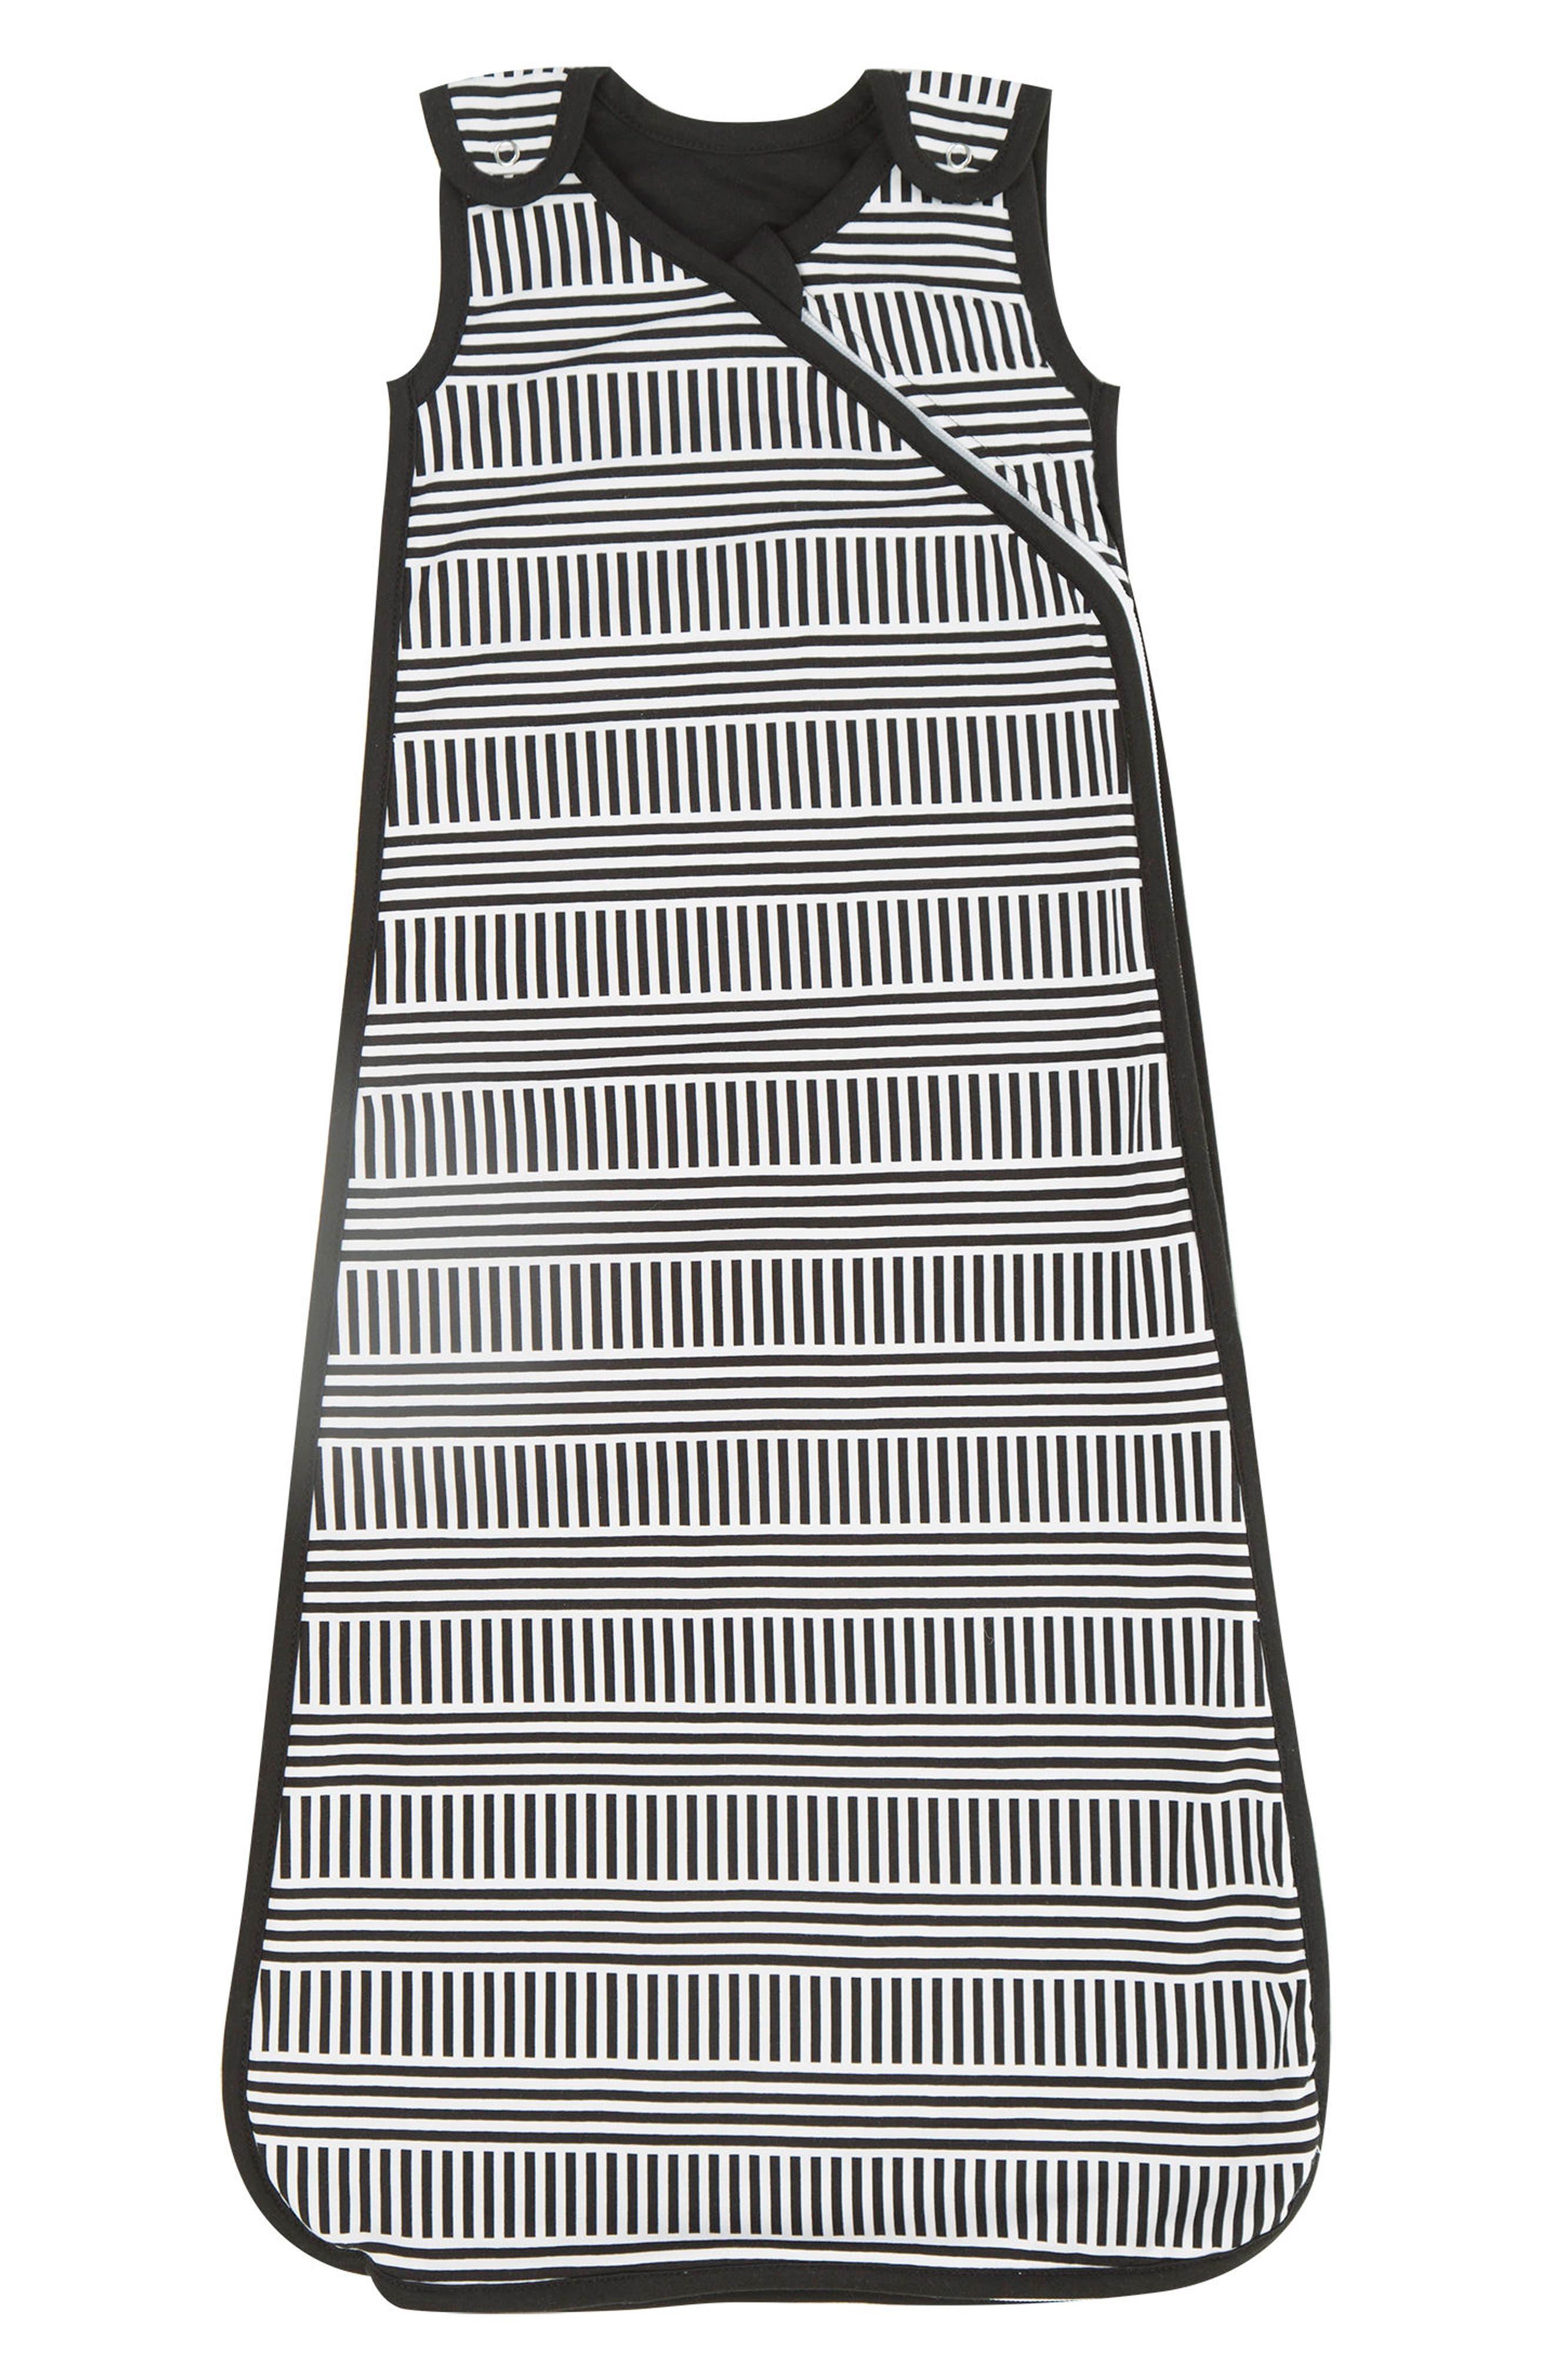 Alternate Image 1 Selected - Oilo Stroller Blanket & Wearable Blanket Set (Baby)